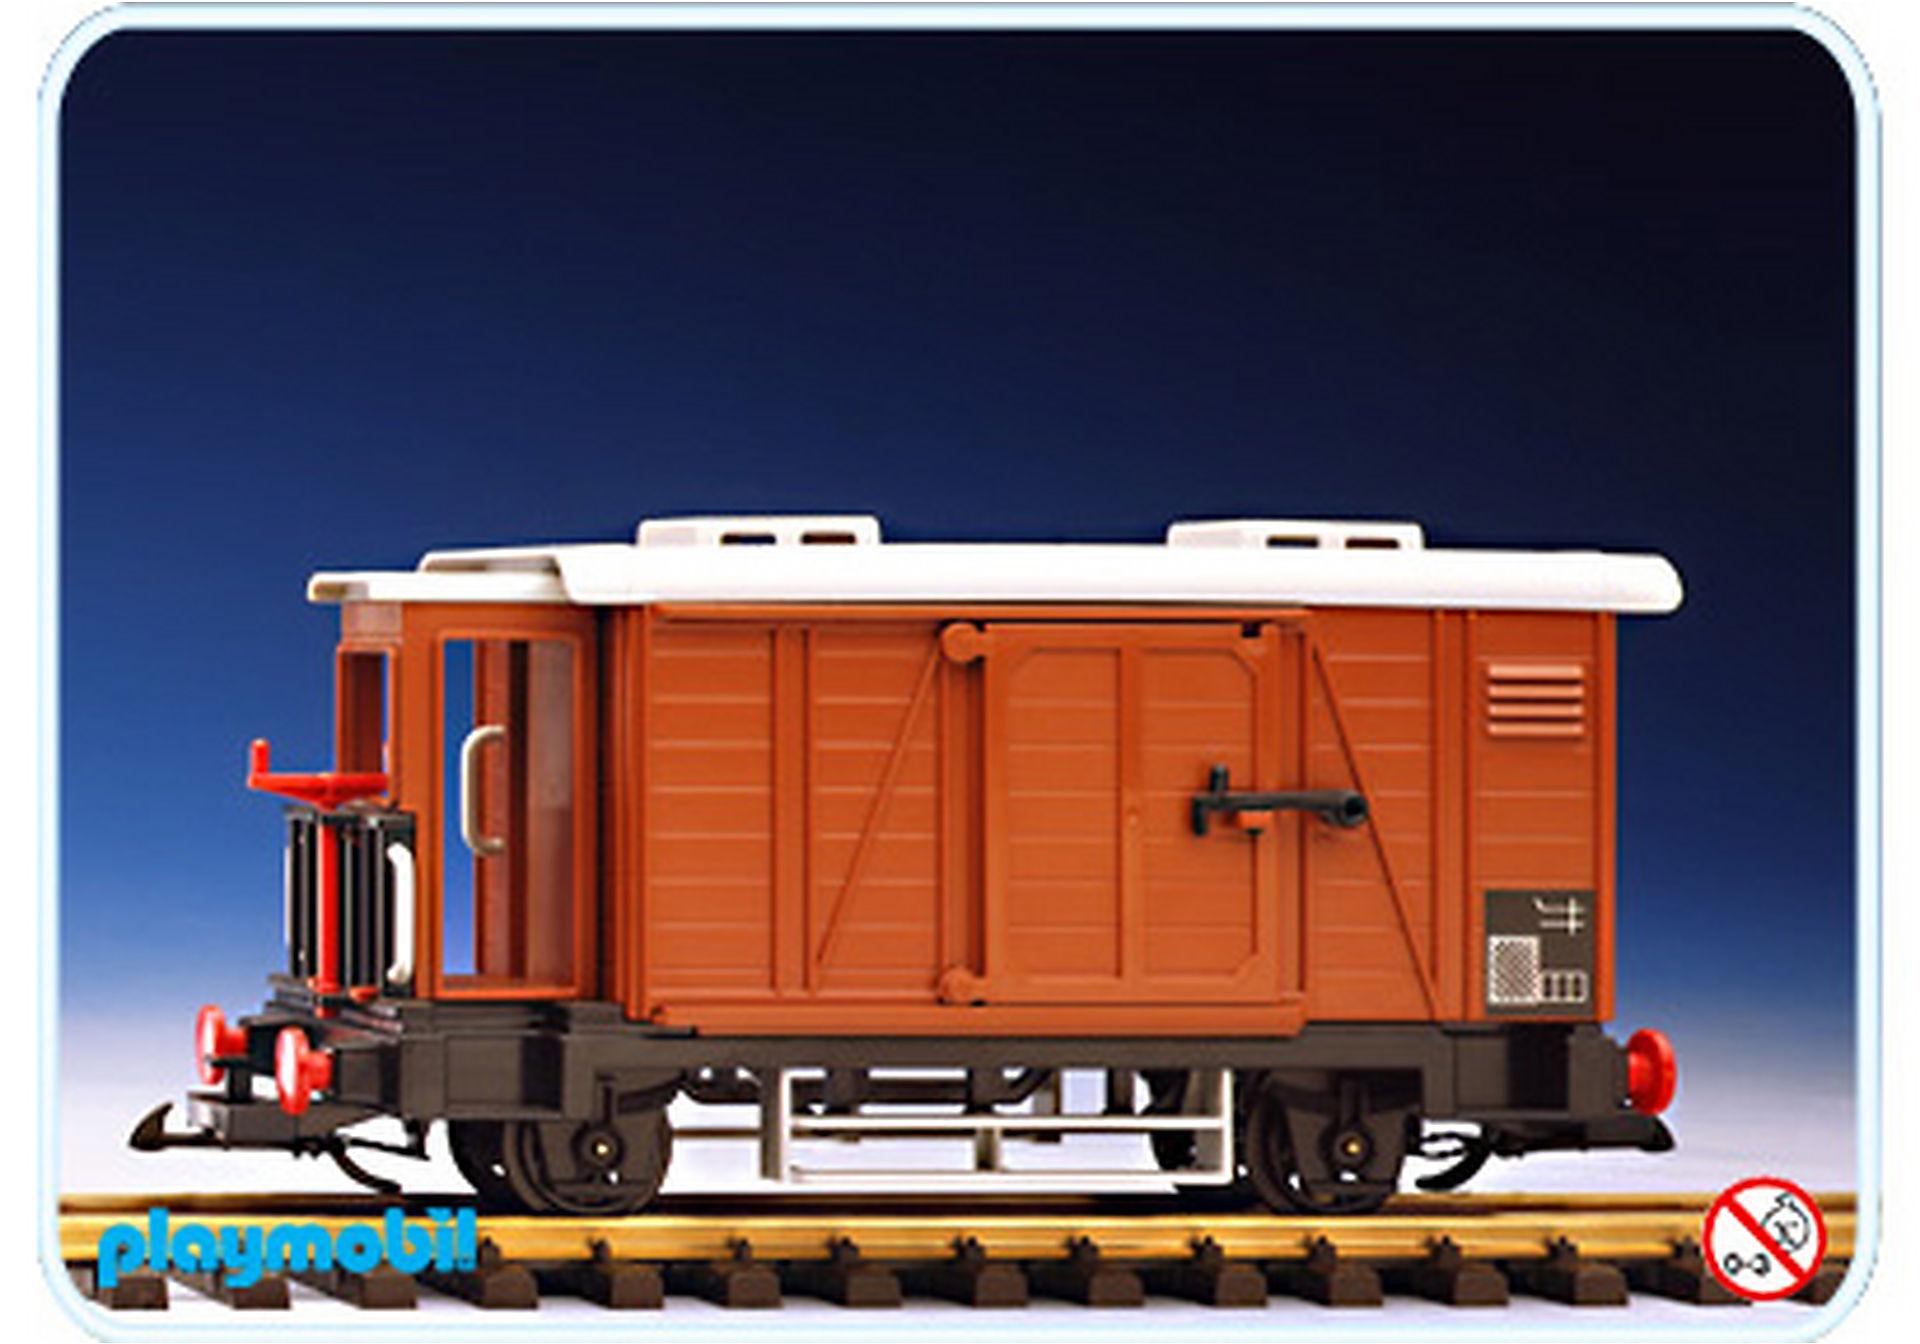 4111-A Geschlossener Güterwagen/Bremserhäuschen zoom image1